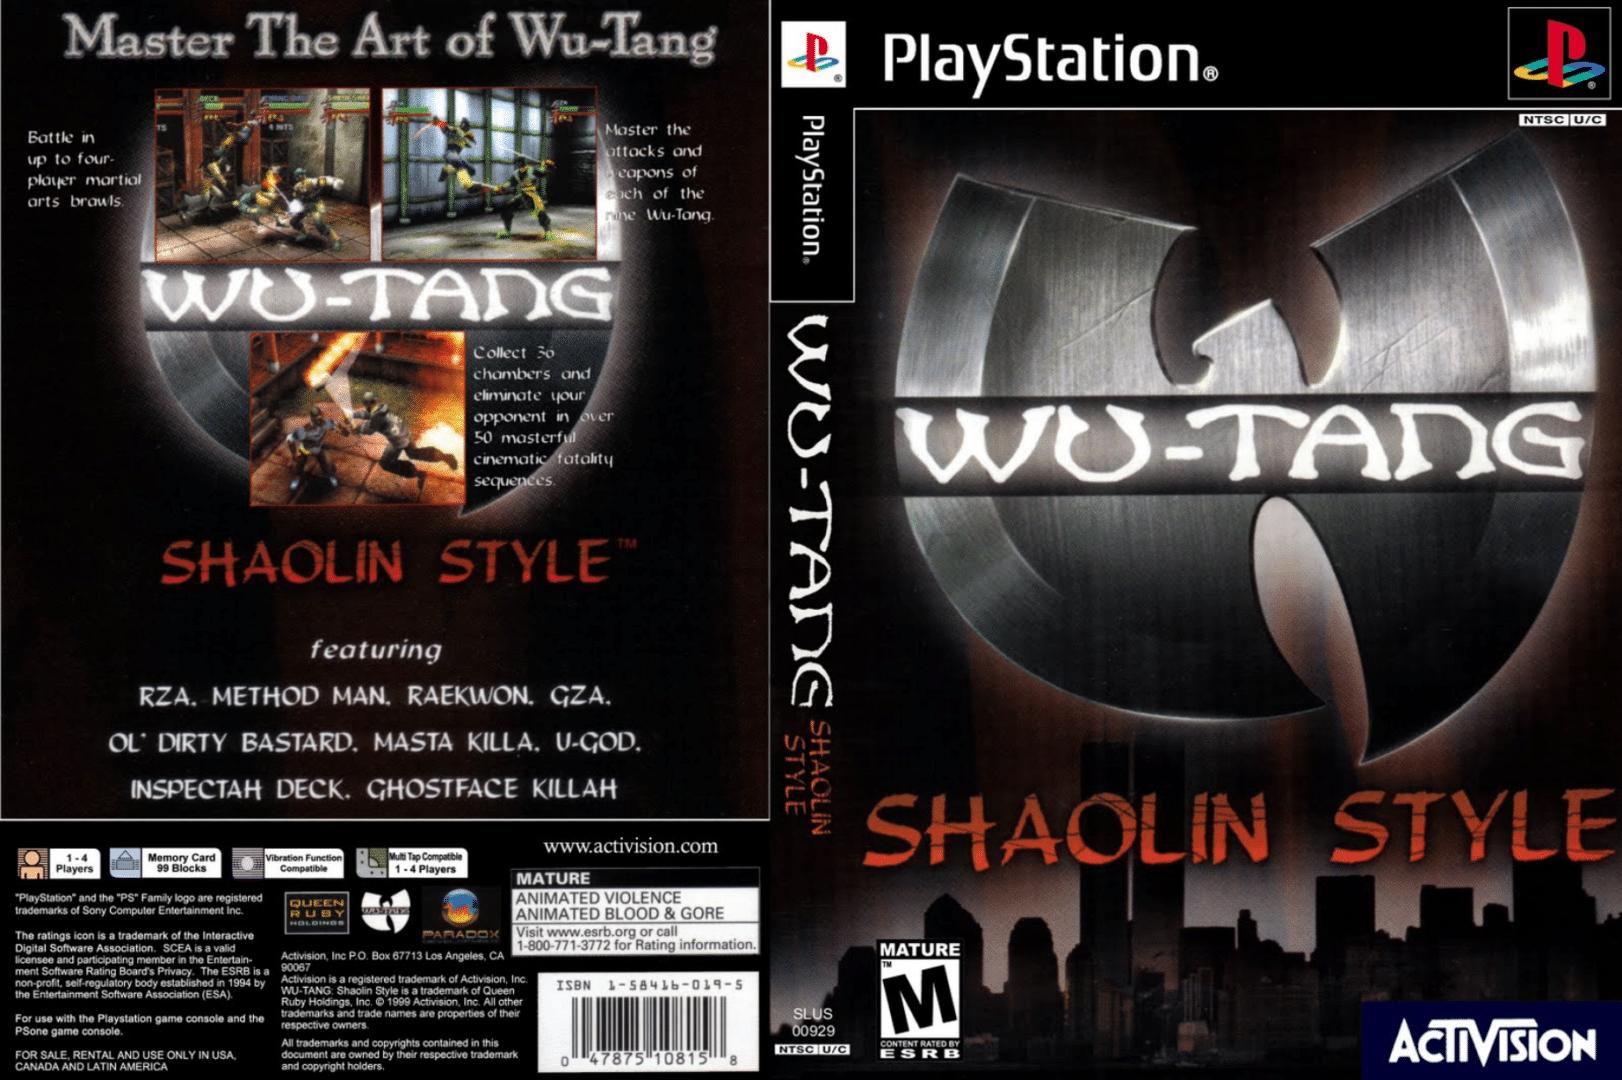 Portada del juego Shaolin Style inspirado en Wu tang clan